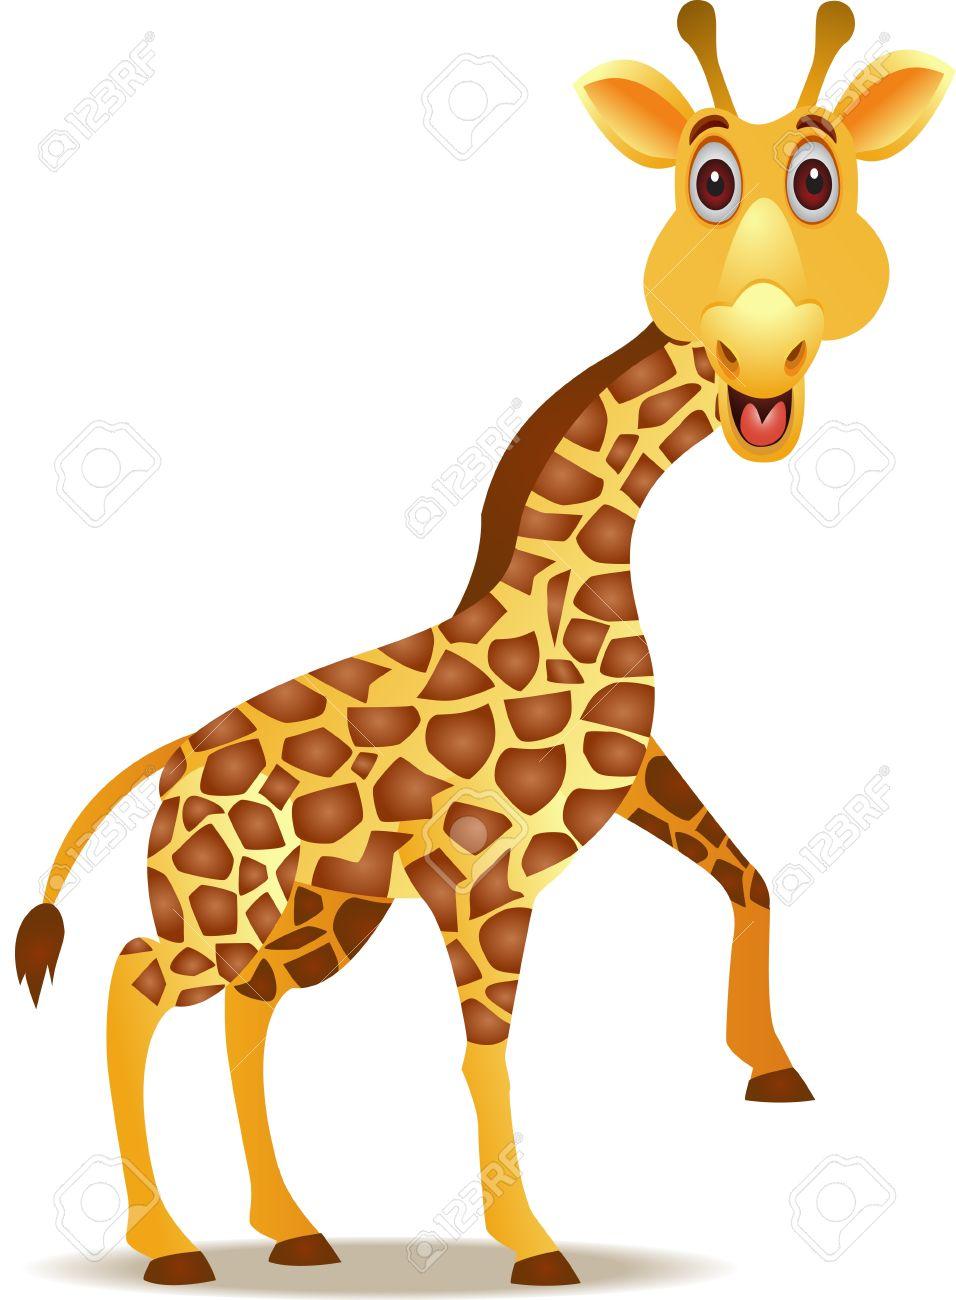 funny giraffe cartoon Stock Vector - 12542748